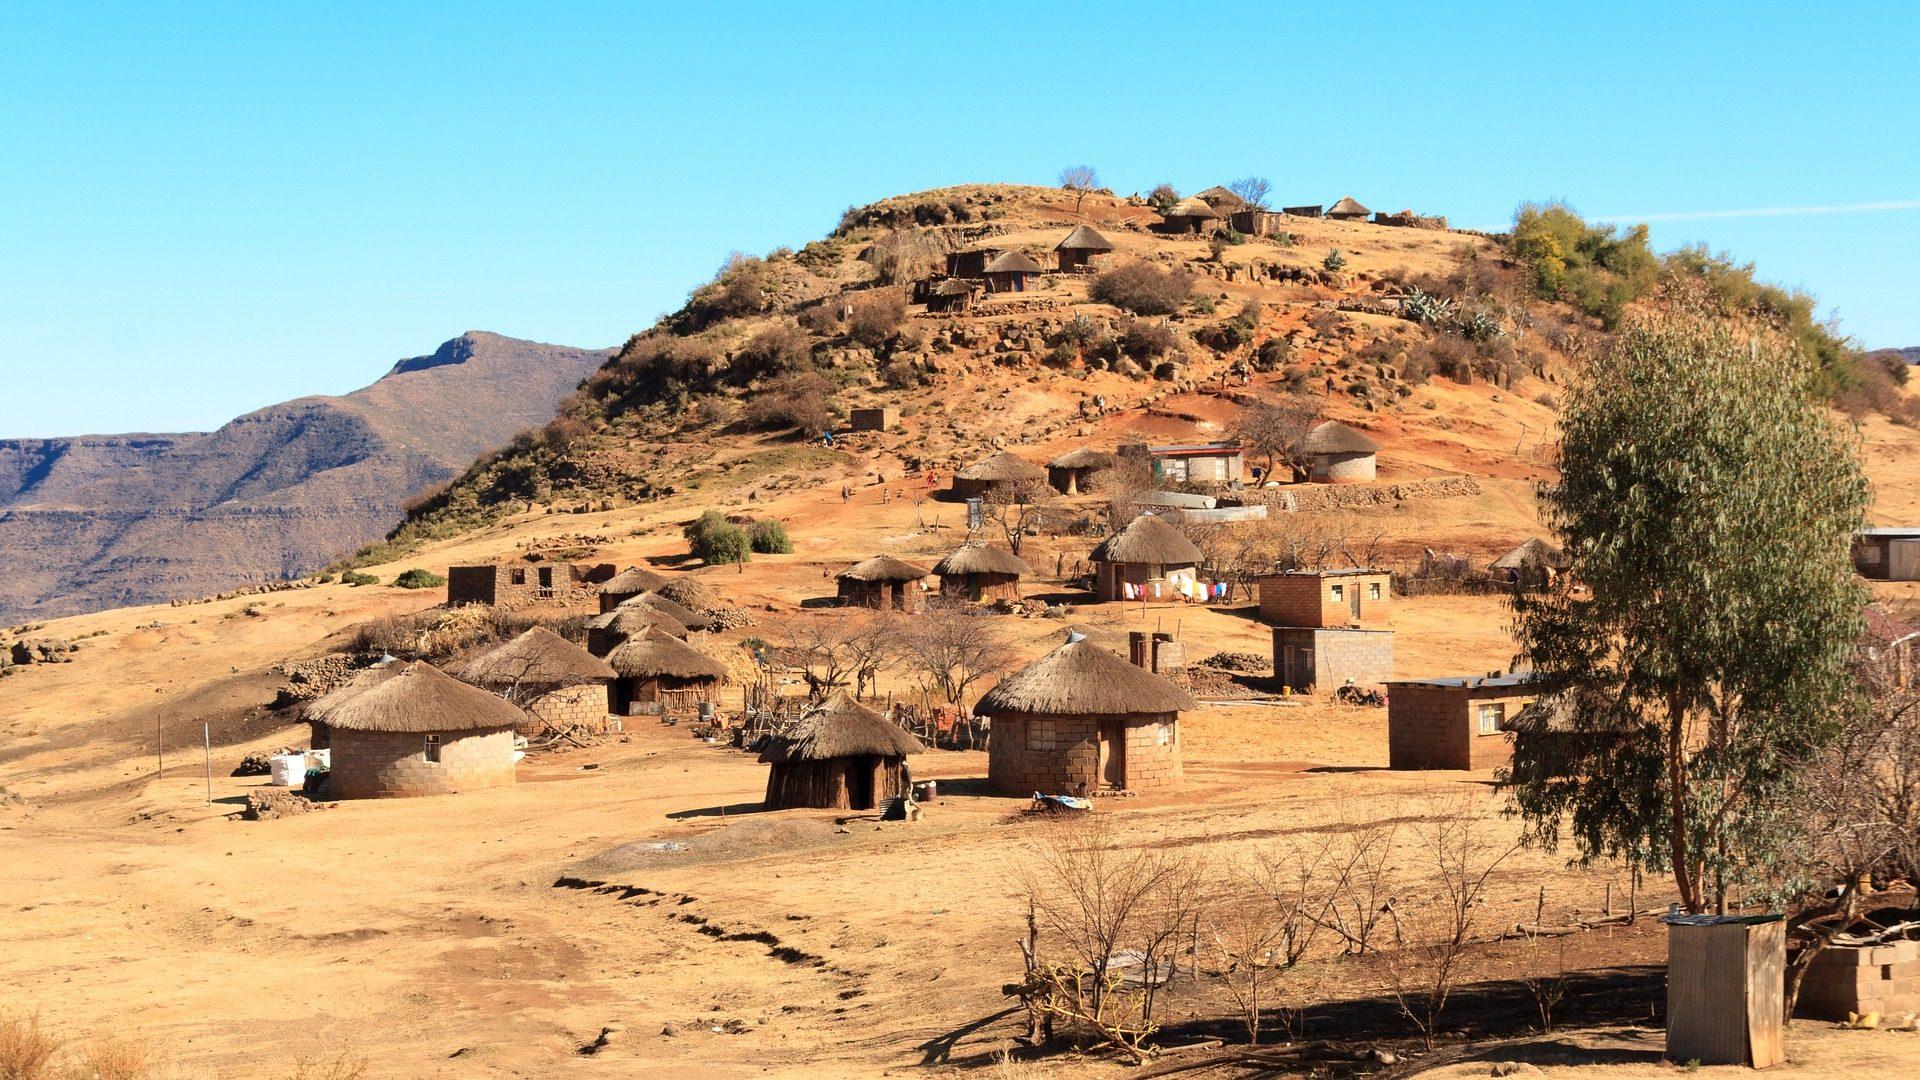 Montagne, Hill, village, cabines, Lesotho, L'Afrique - Fonds d'écran HD - Professor-falken.com